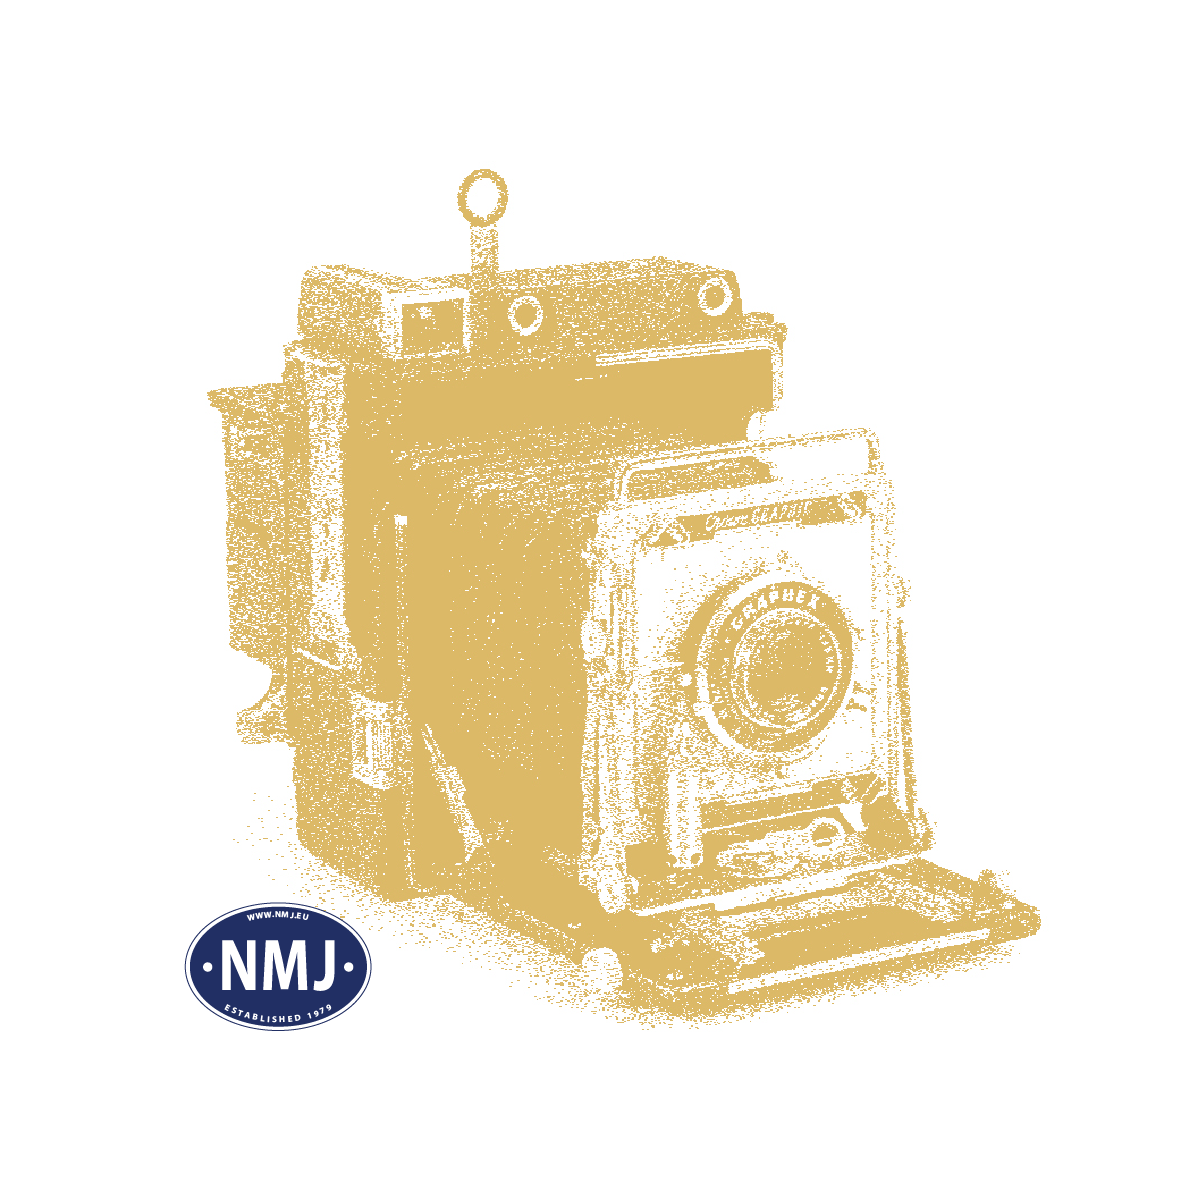 NMJ Topline NSB DI3.602 Grønn, 0-Skala, DCC m/ Lyd